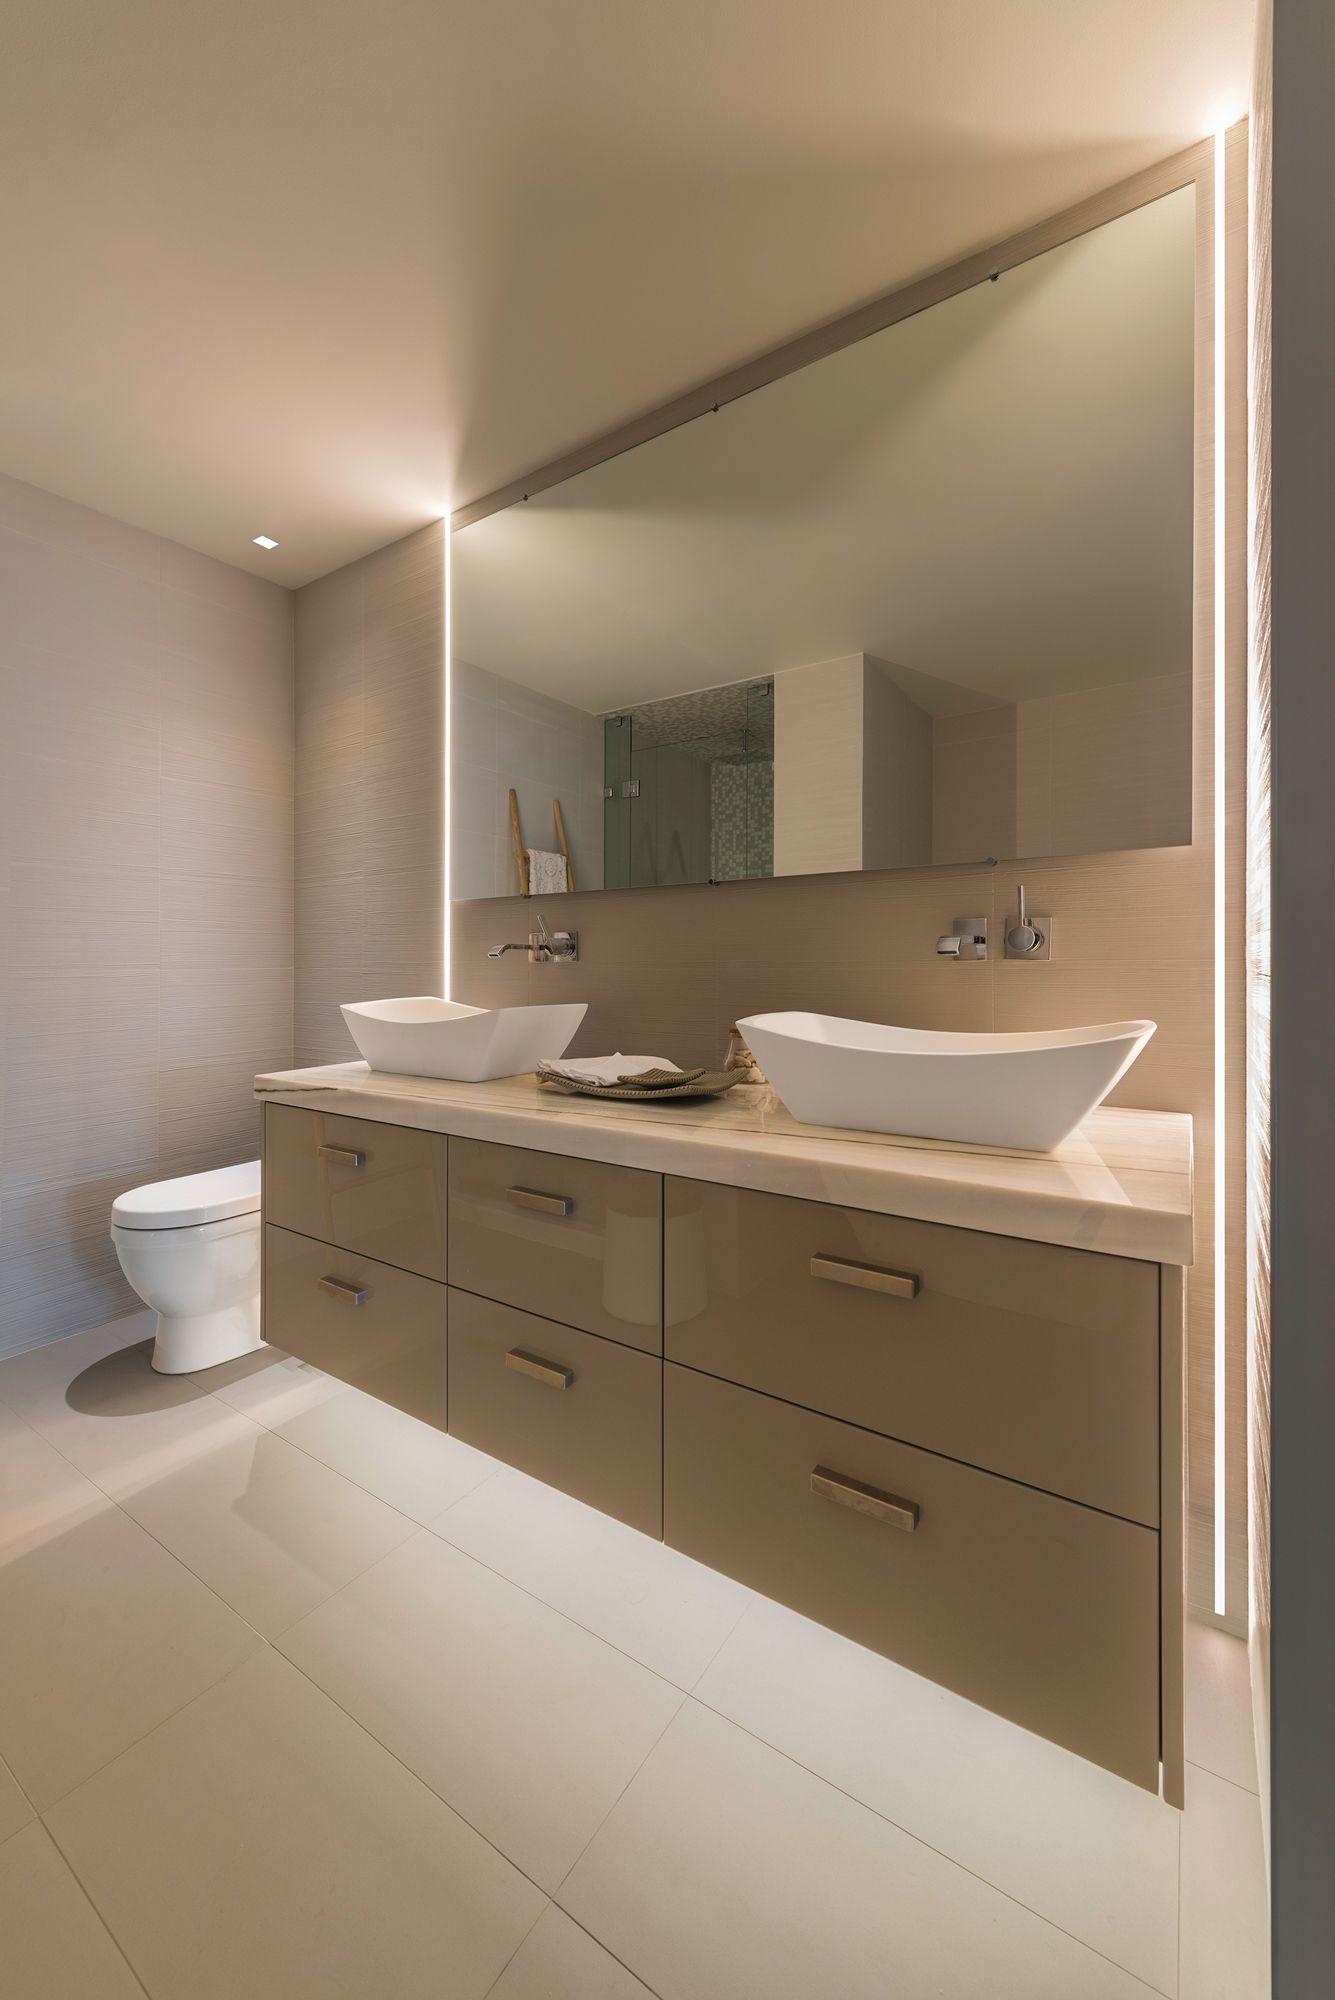 Modern bathroom lighting system